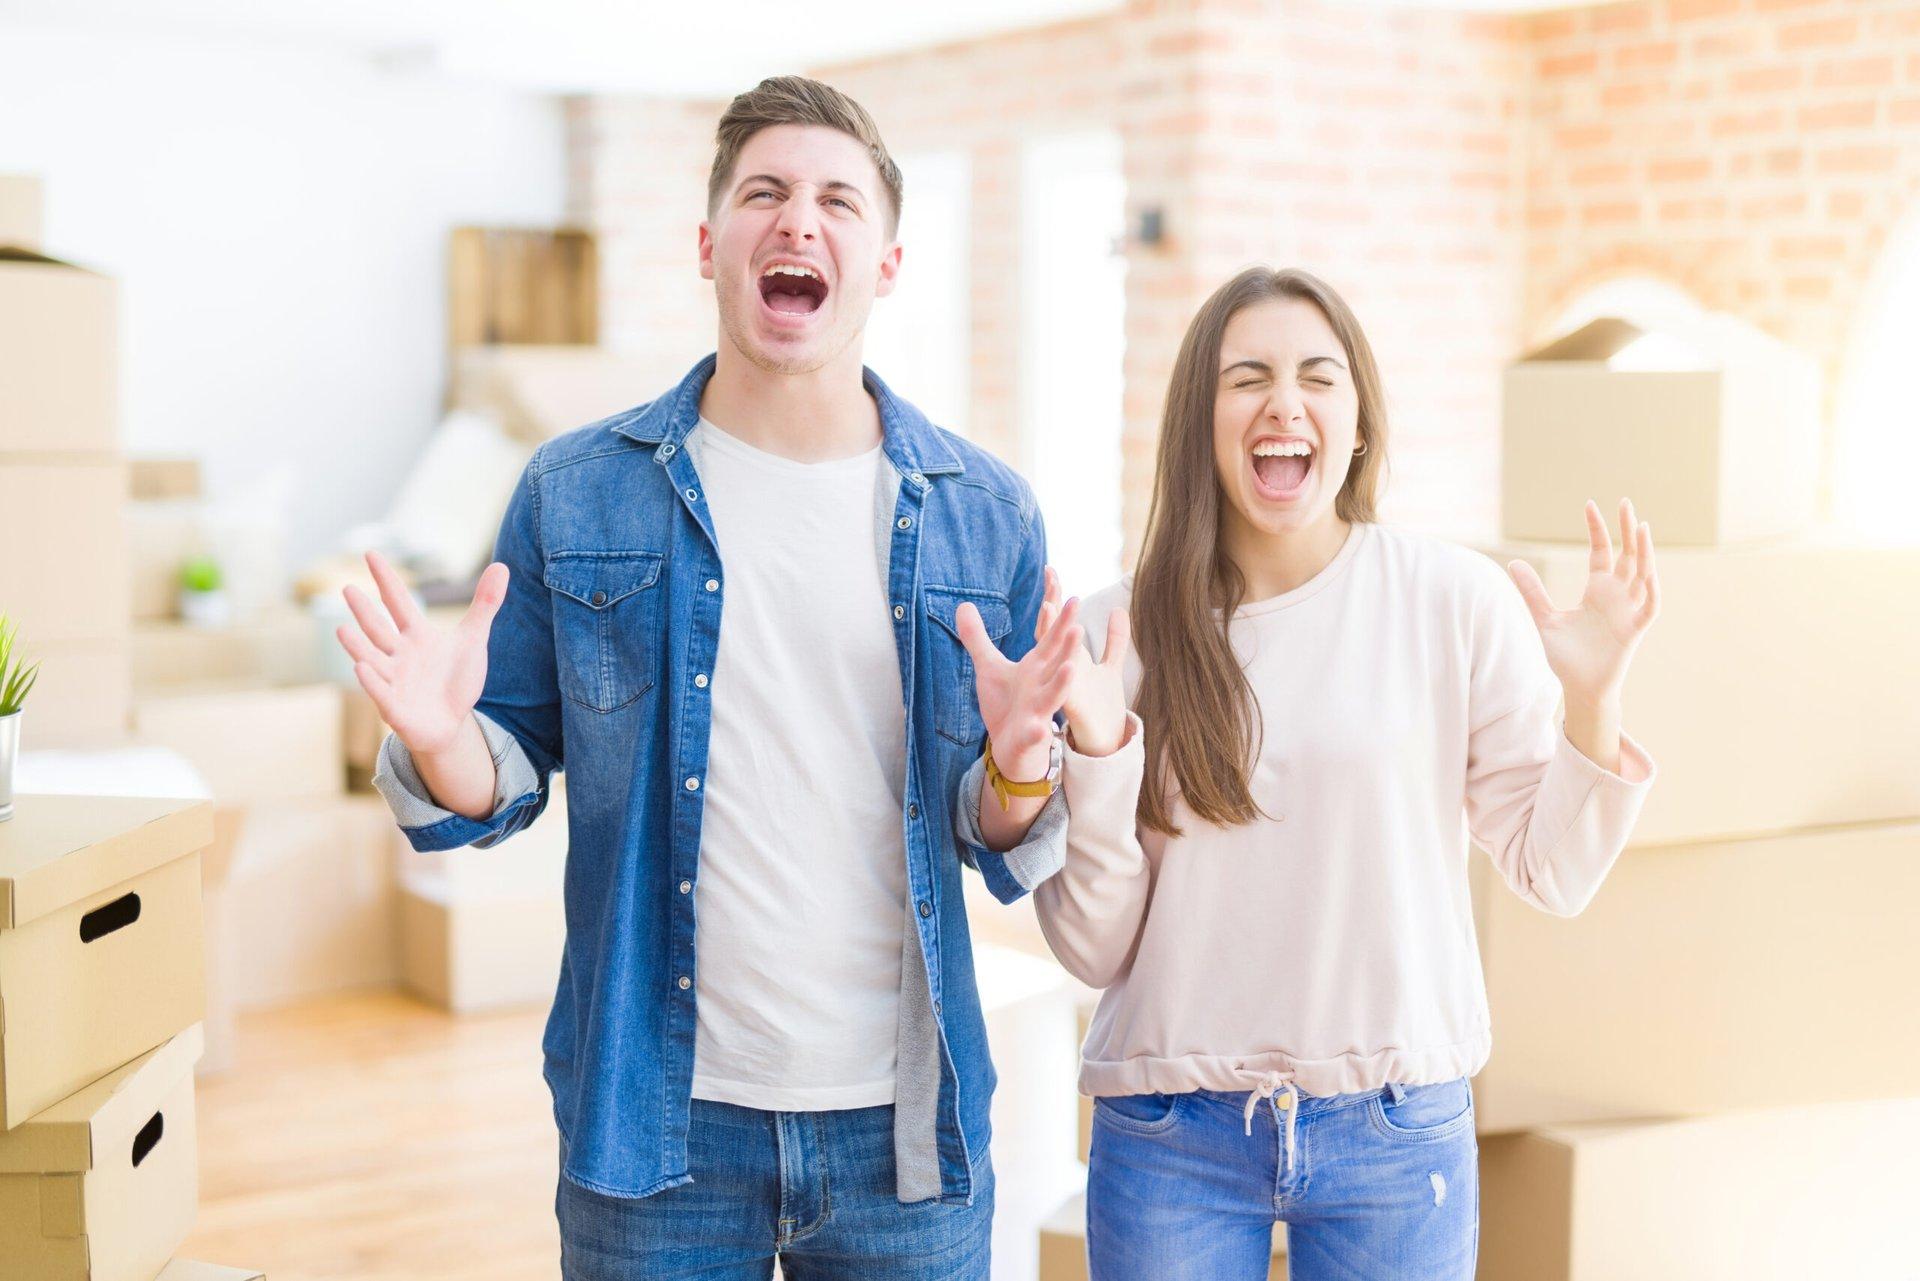 Unhappy homebuyers